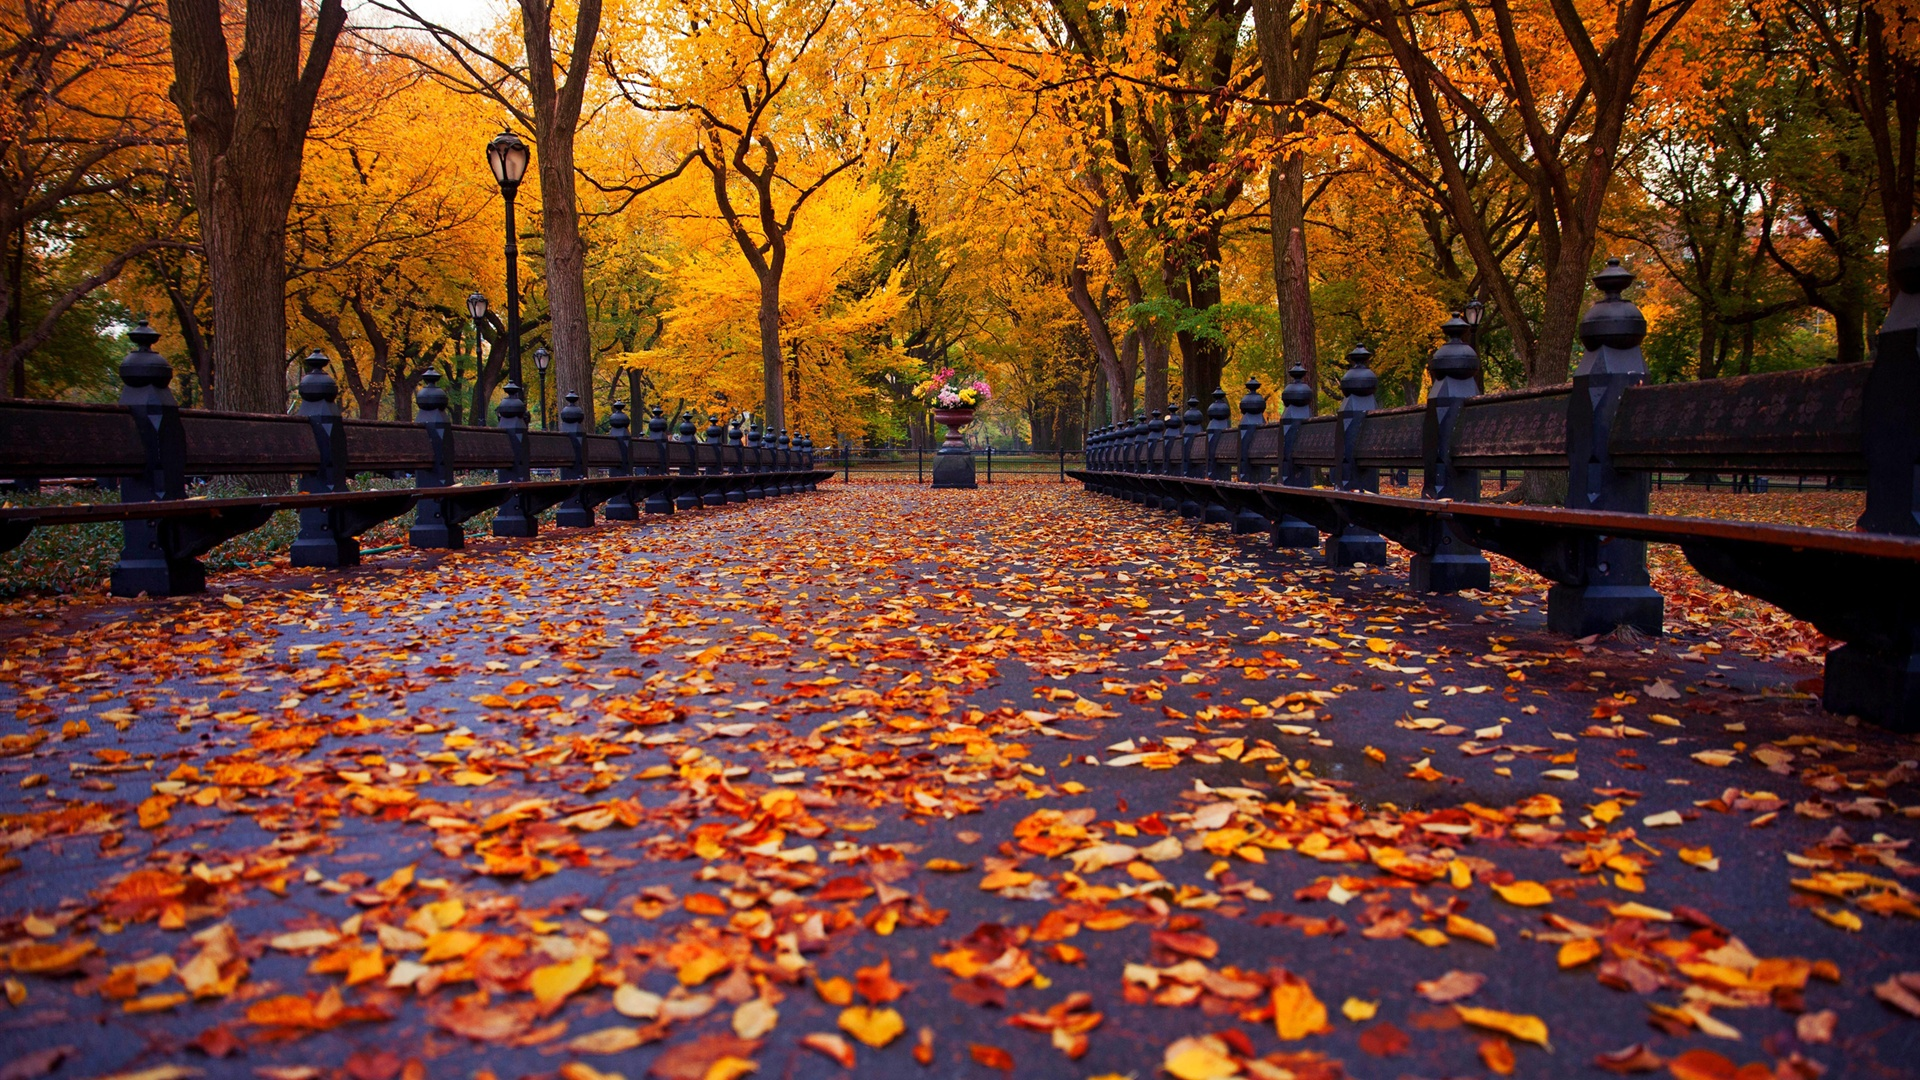 autumn park wallpaper 1920x1080 - photo #20